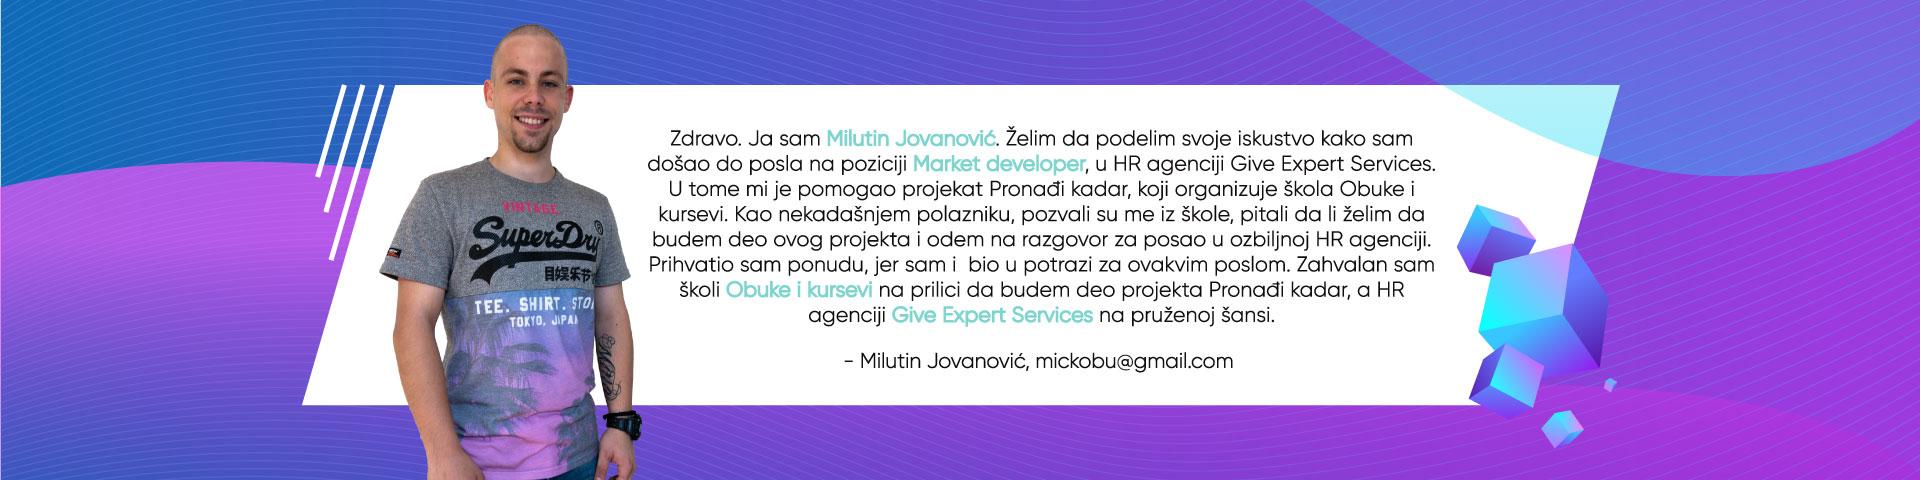 Milutin_Jovanovic_Slider